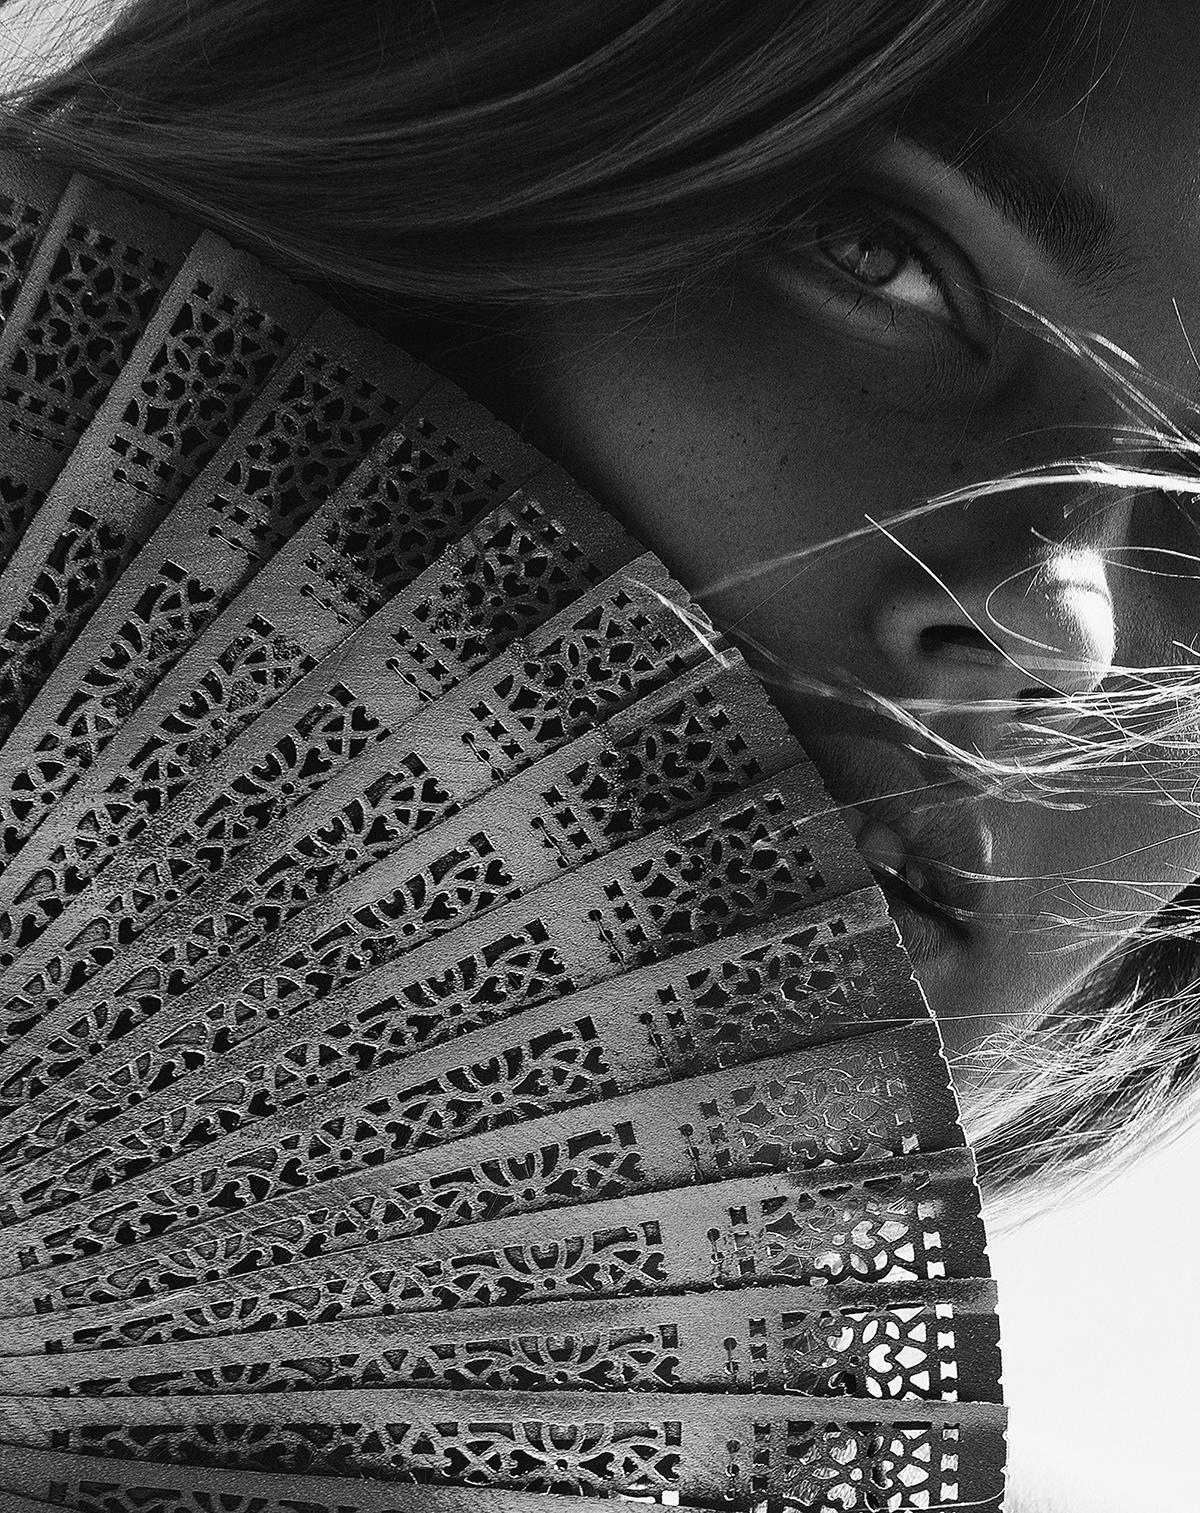 Ana Kuni by Linnea Frank